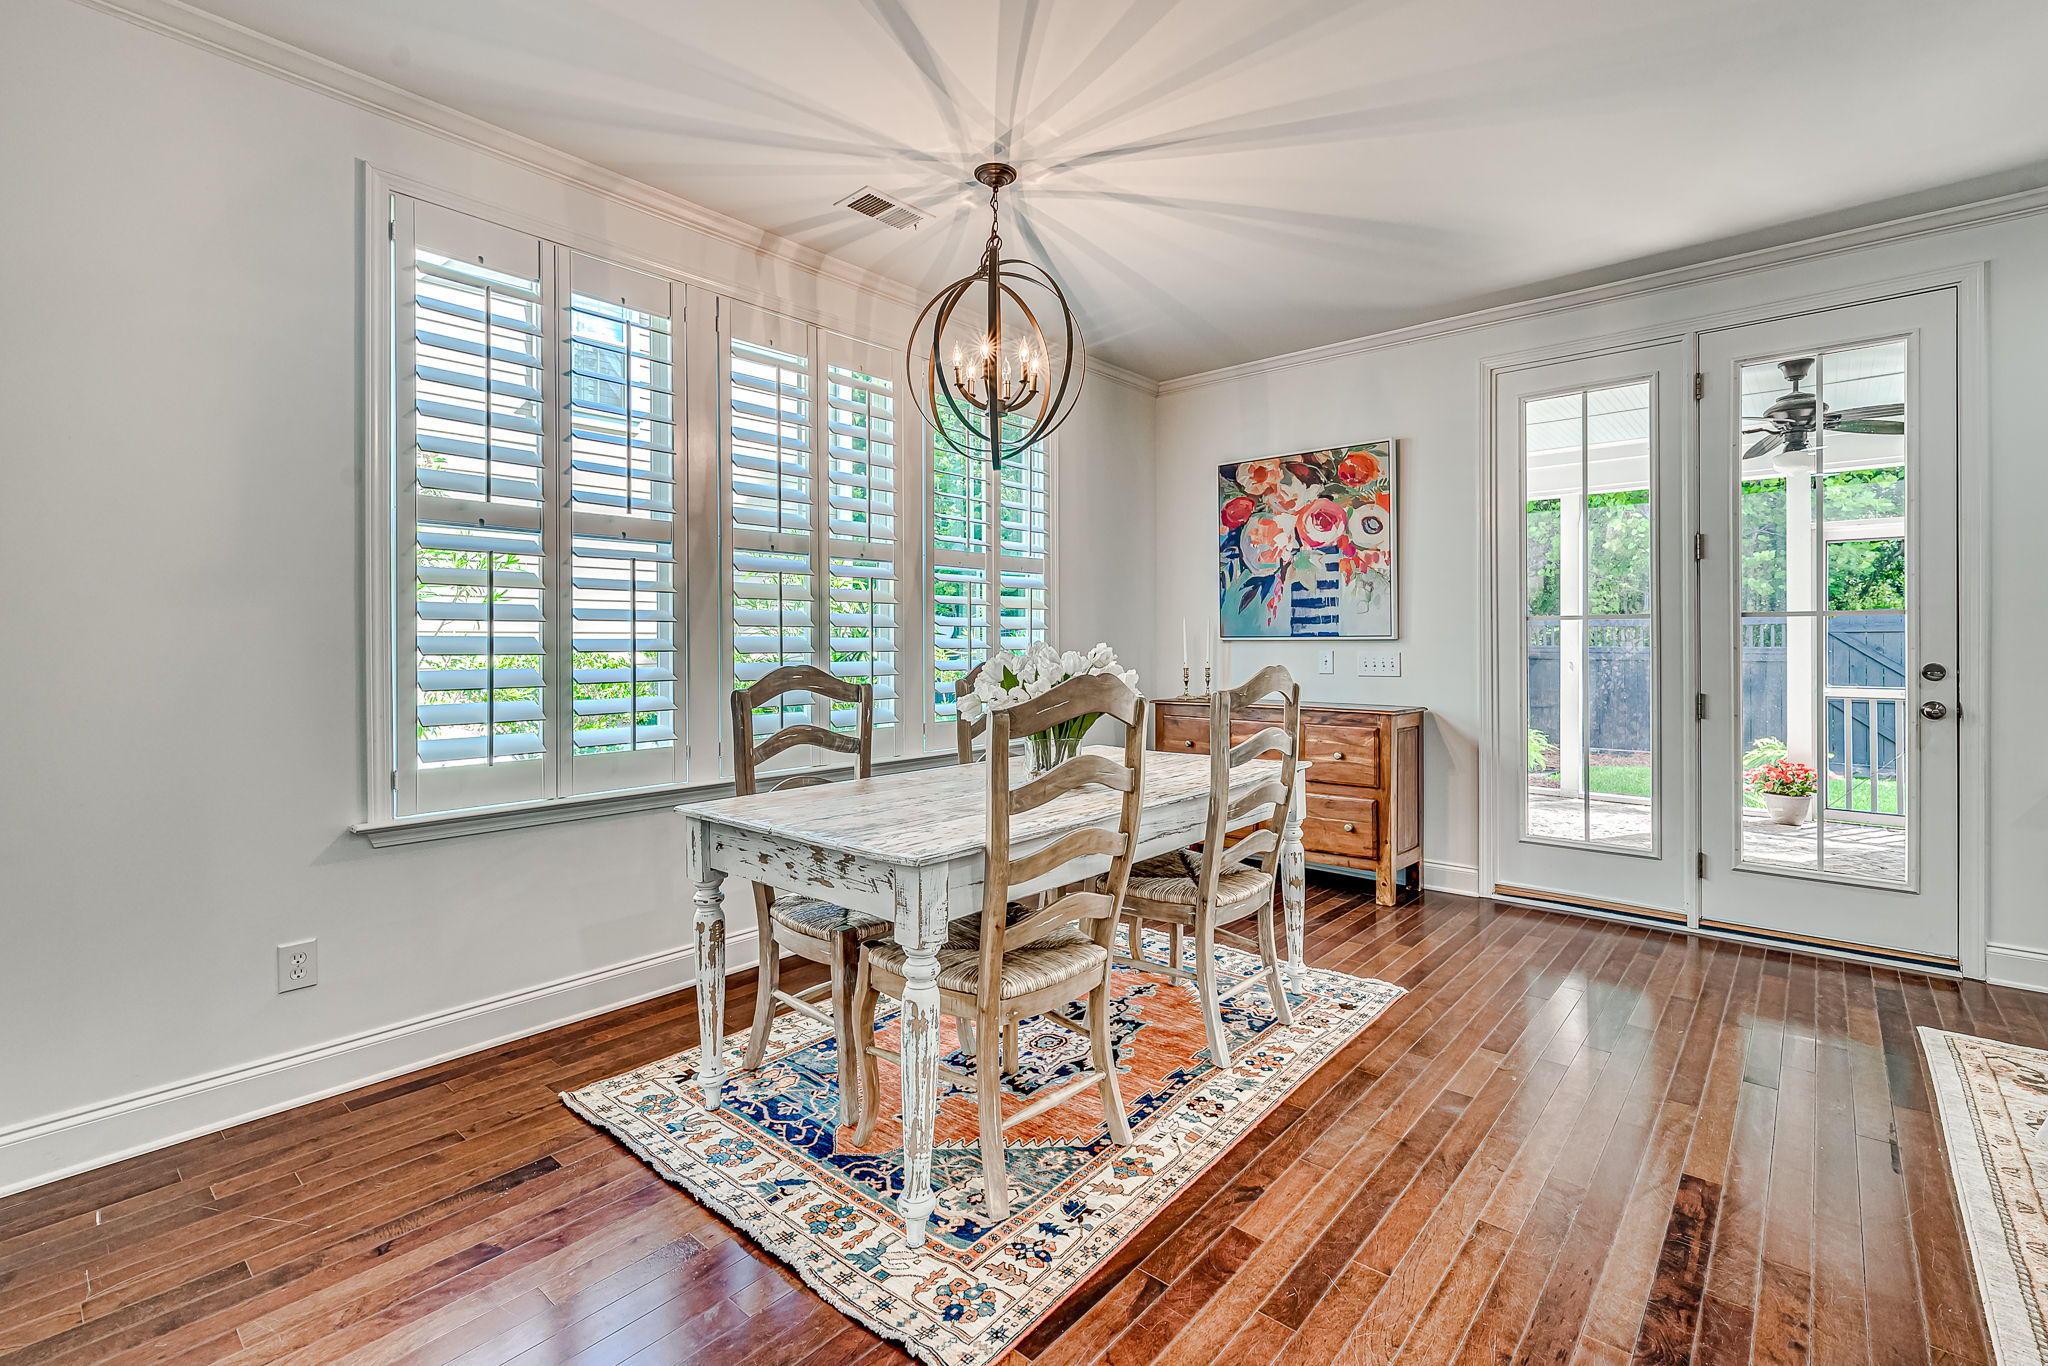 Dunes West Homes For Sale - 2476 Kings Gate, Mount Pleasant, SC - 45